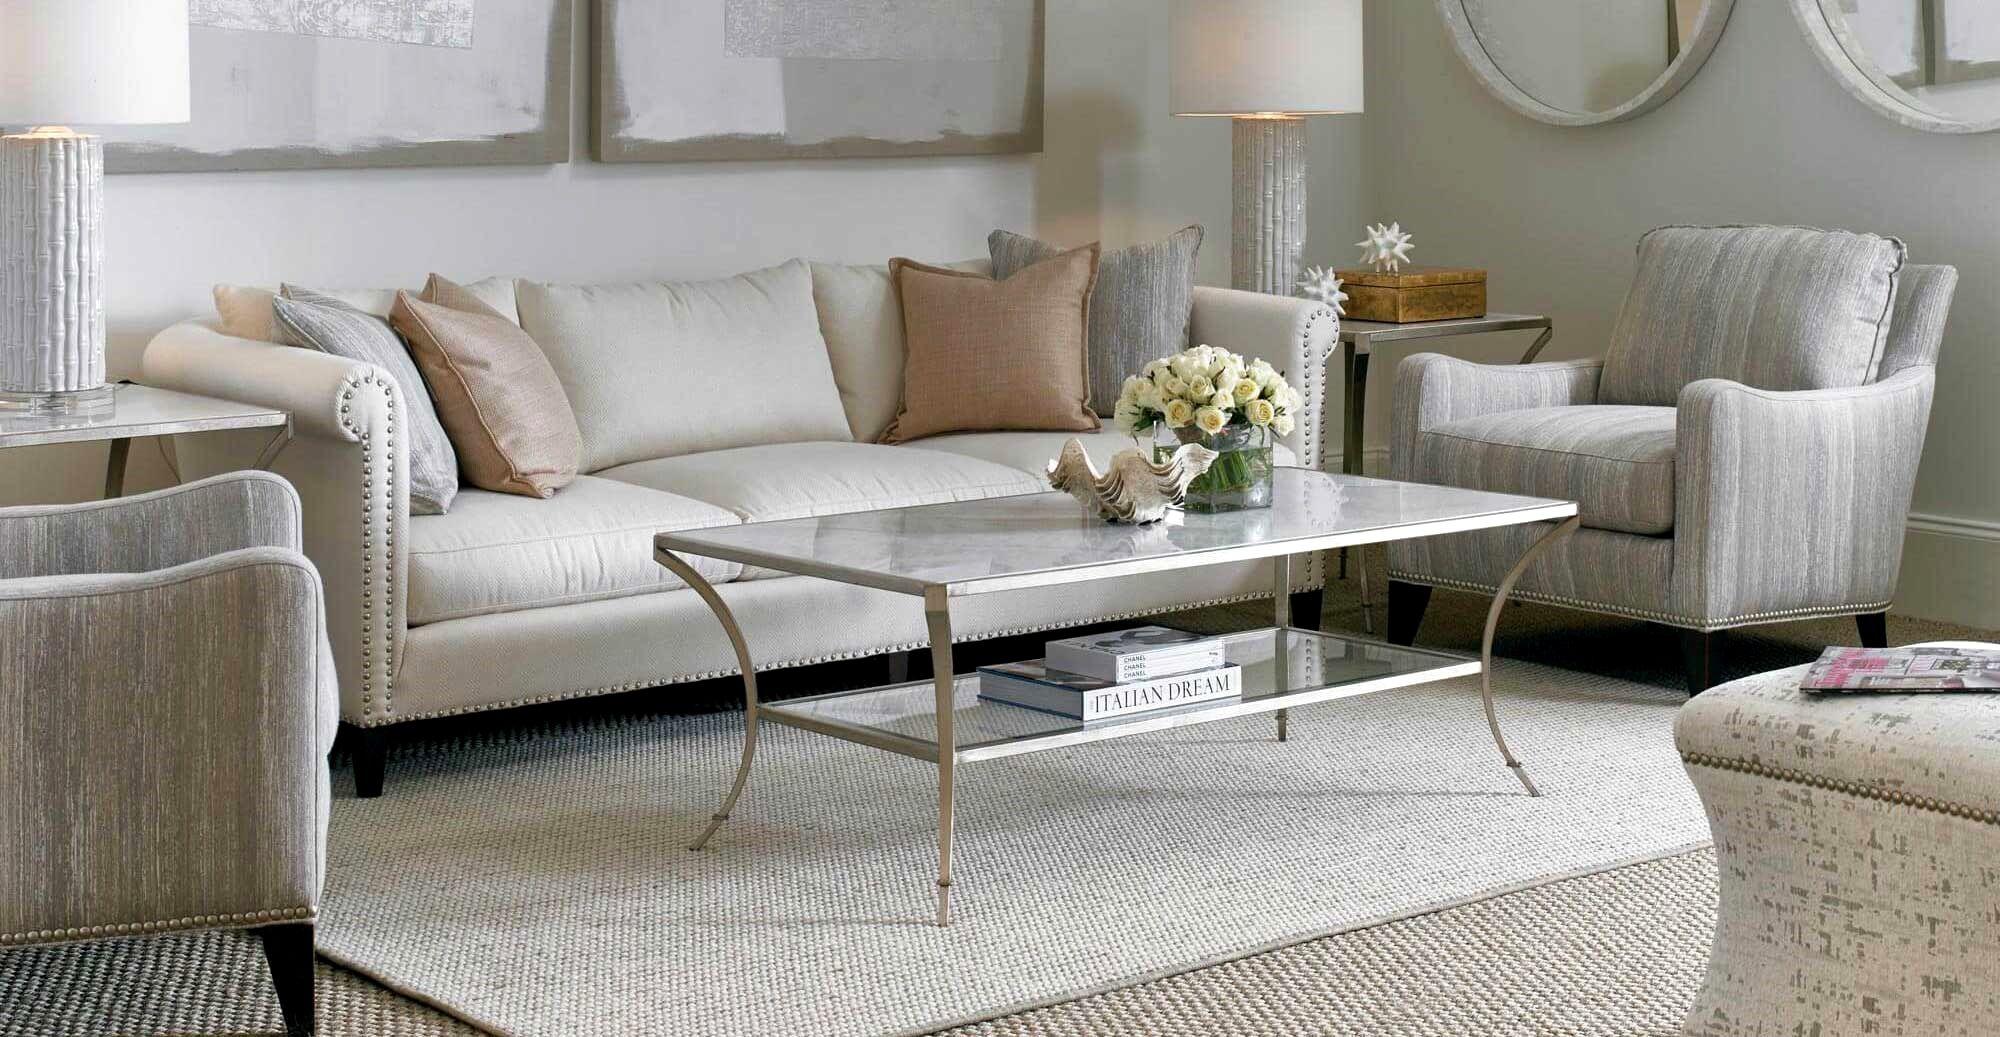 Furniture Stores Salem Va Trick Buy Living Room Furniture Unique Living Room Furniture Furniture